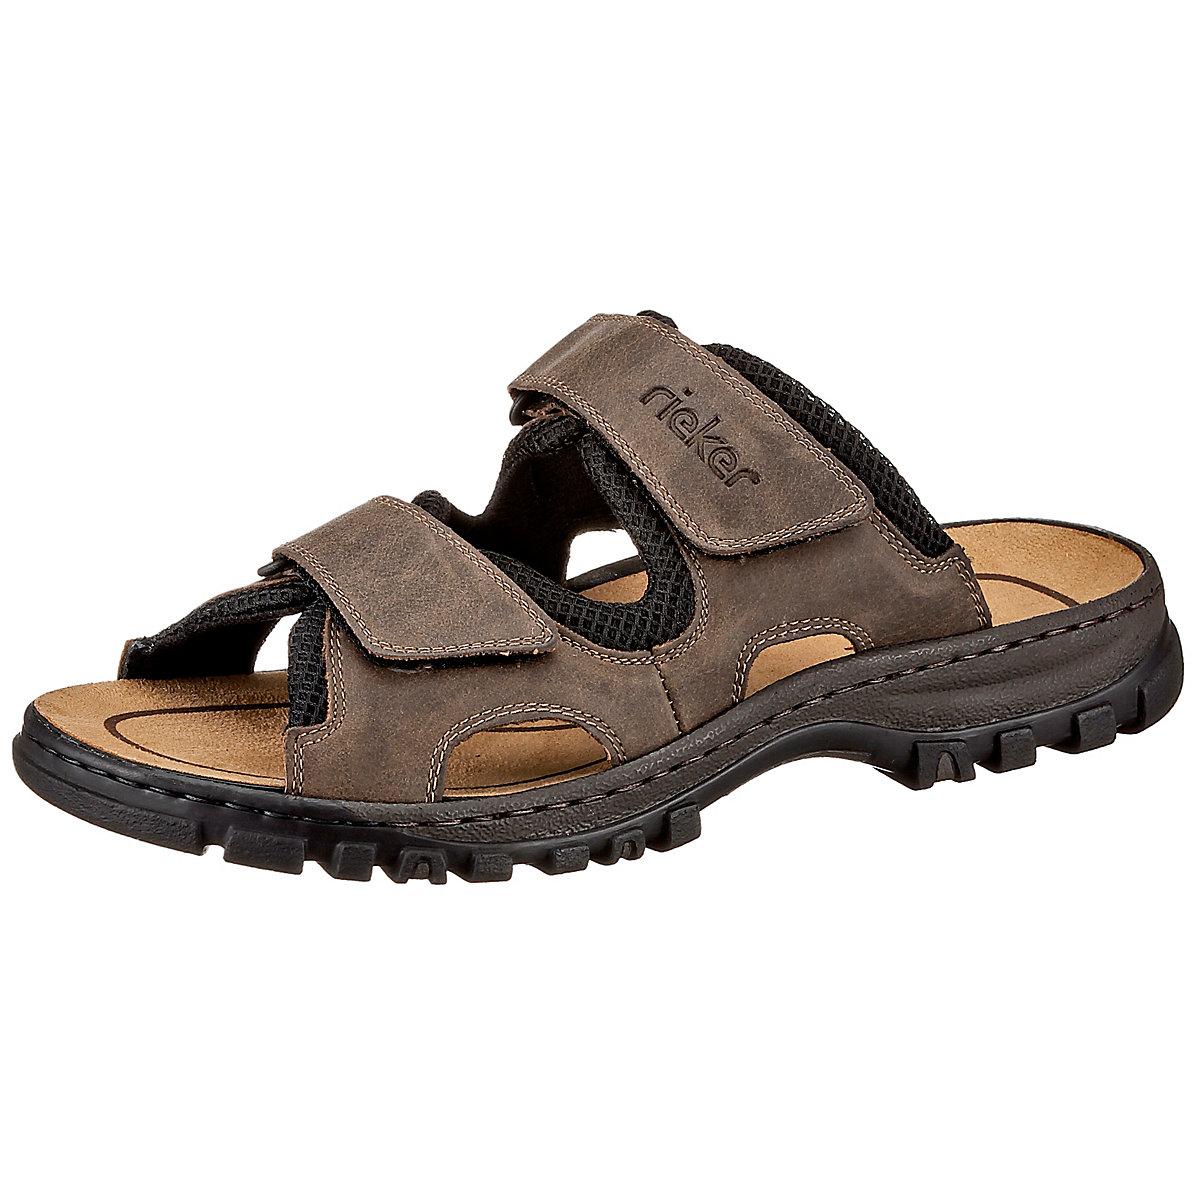 25092 26 Rieker Herren Pantolette sandale Hausschuh **NEU